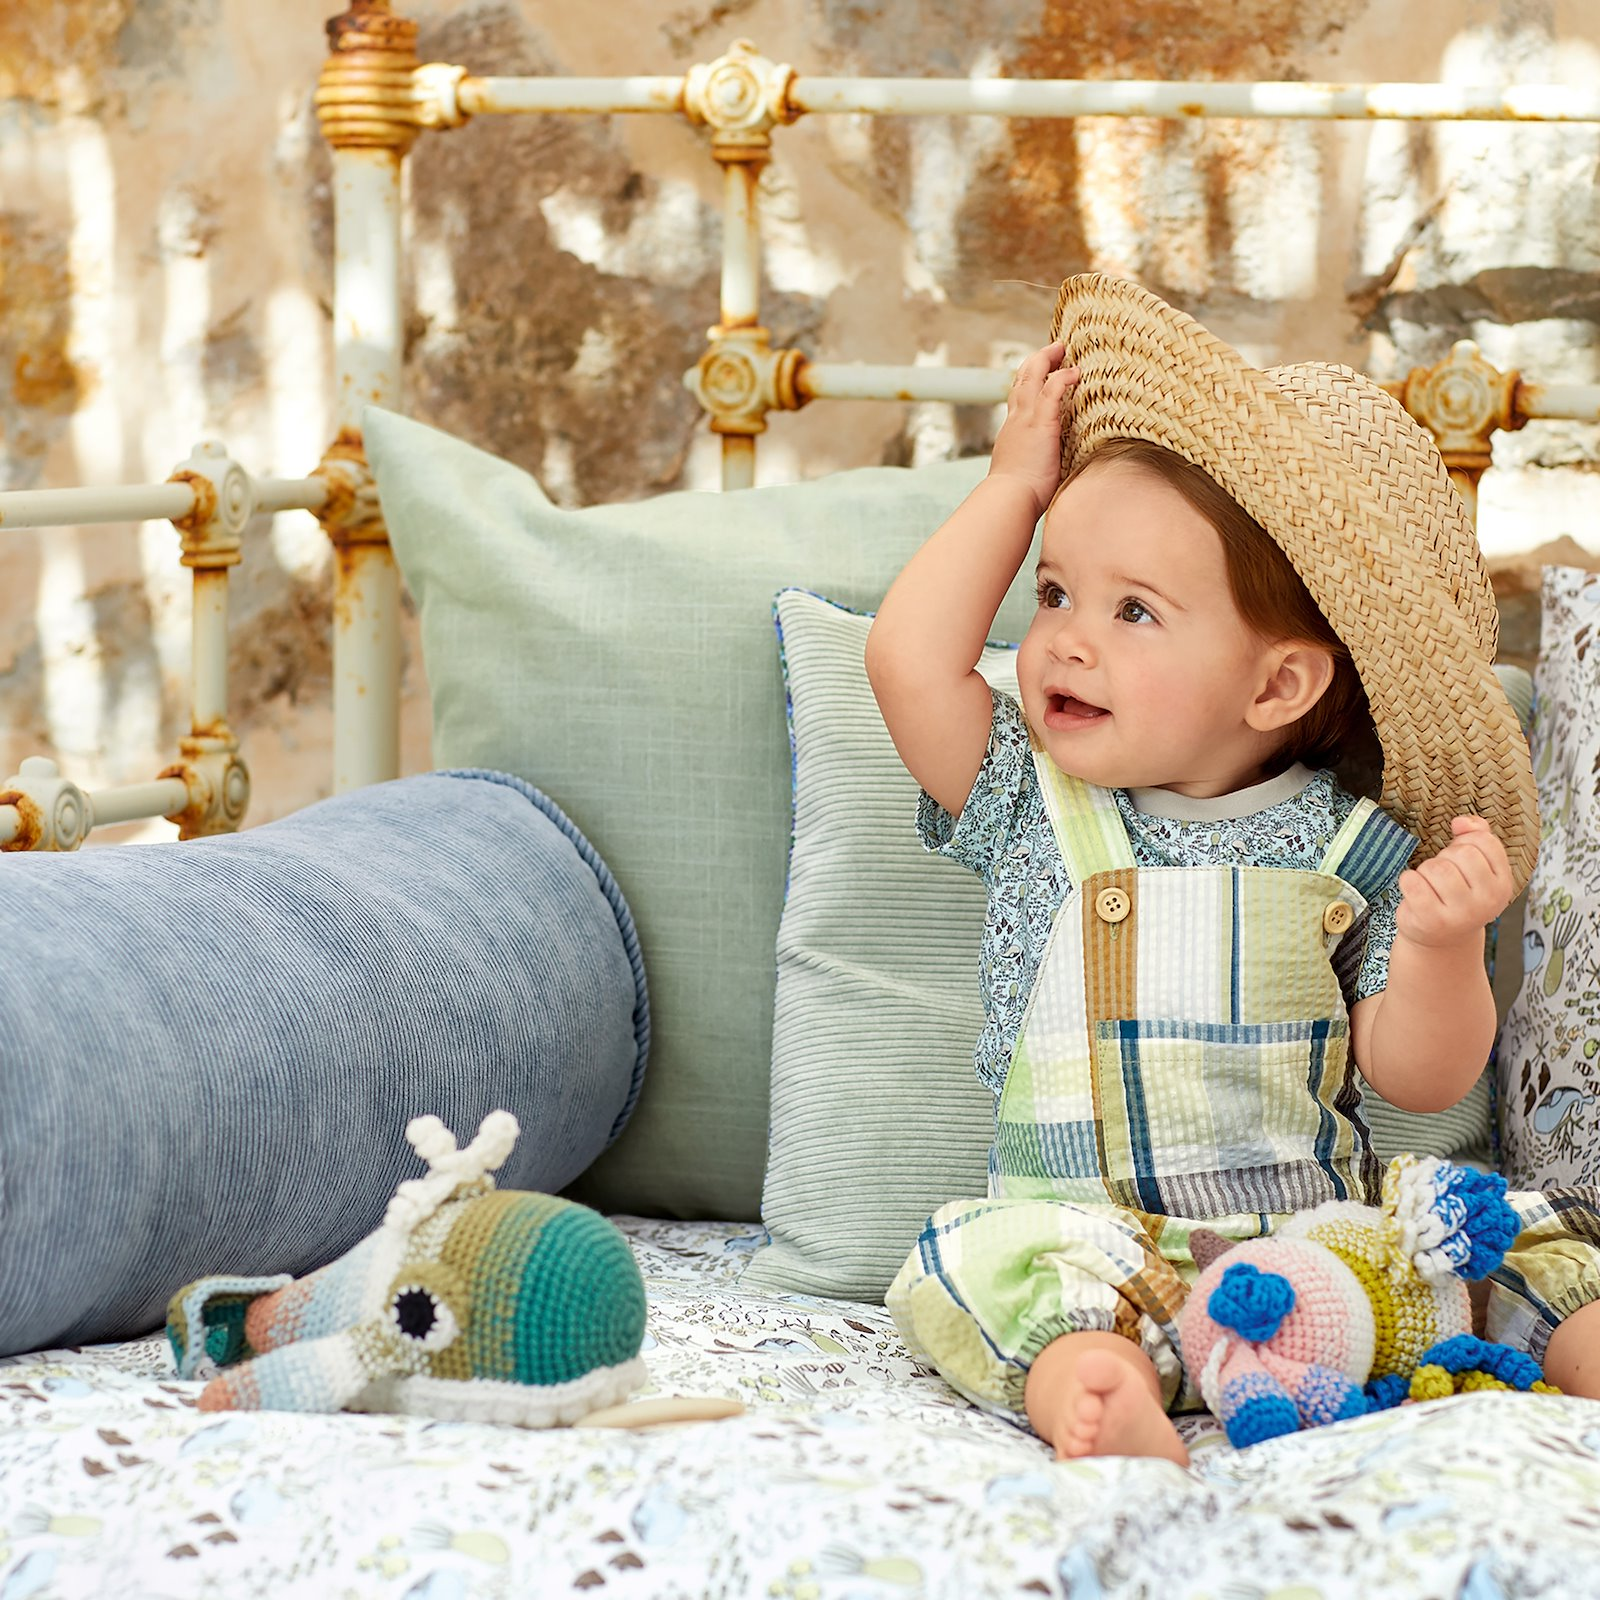 Upholstery corduroy 6 wales pastel blue 824036_824035_852215_p90076_780524_21400_p80007_580048_bundle